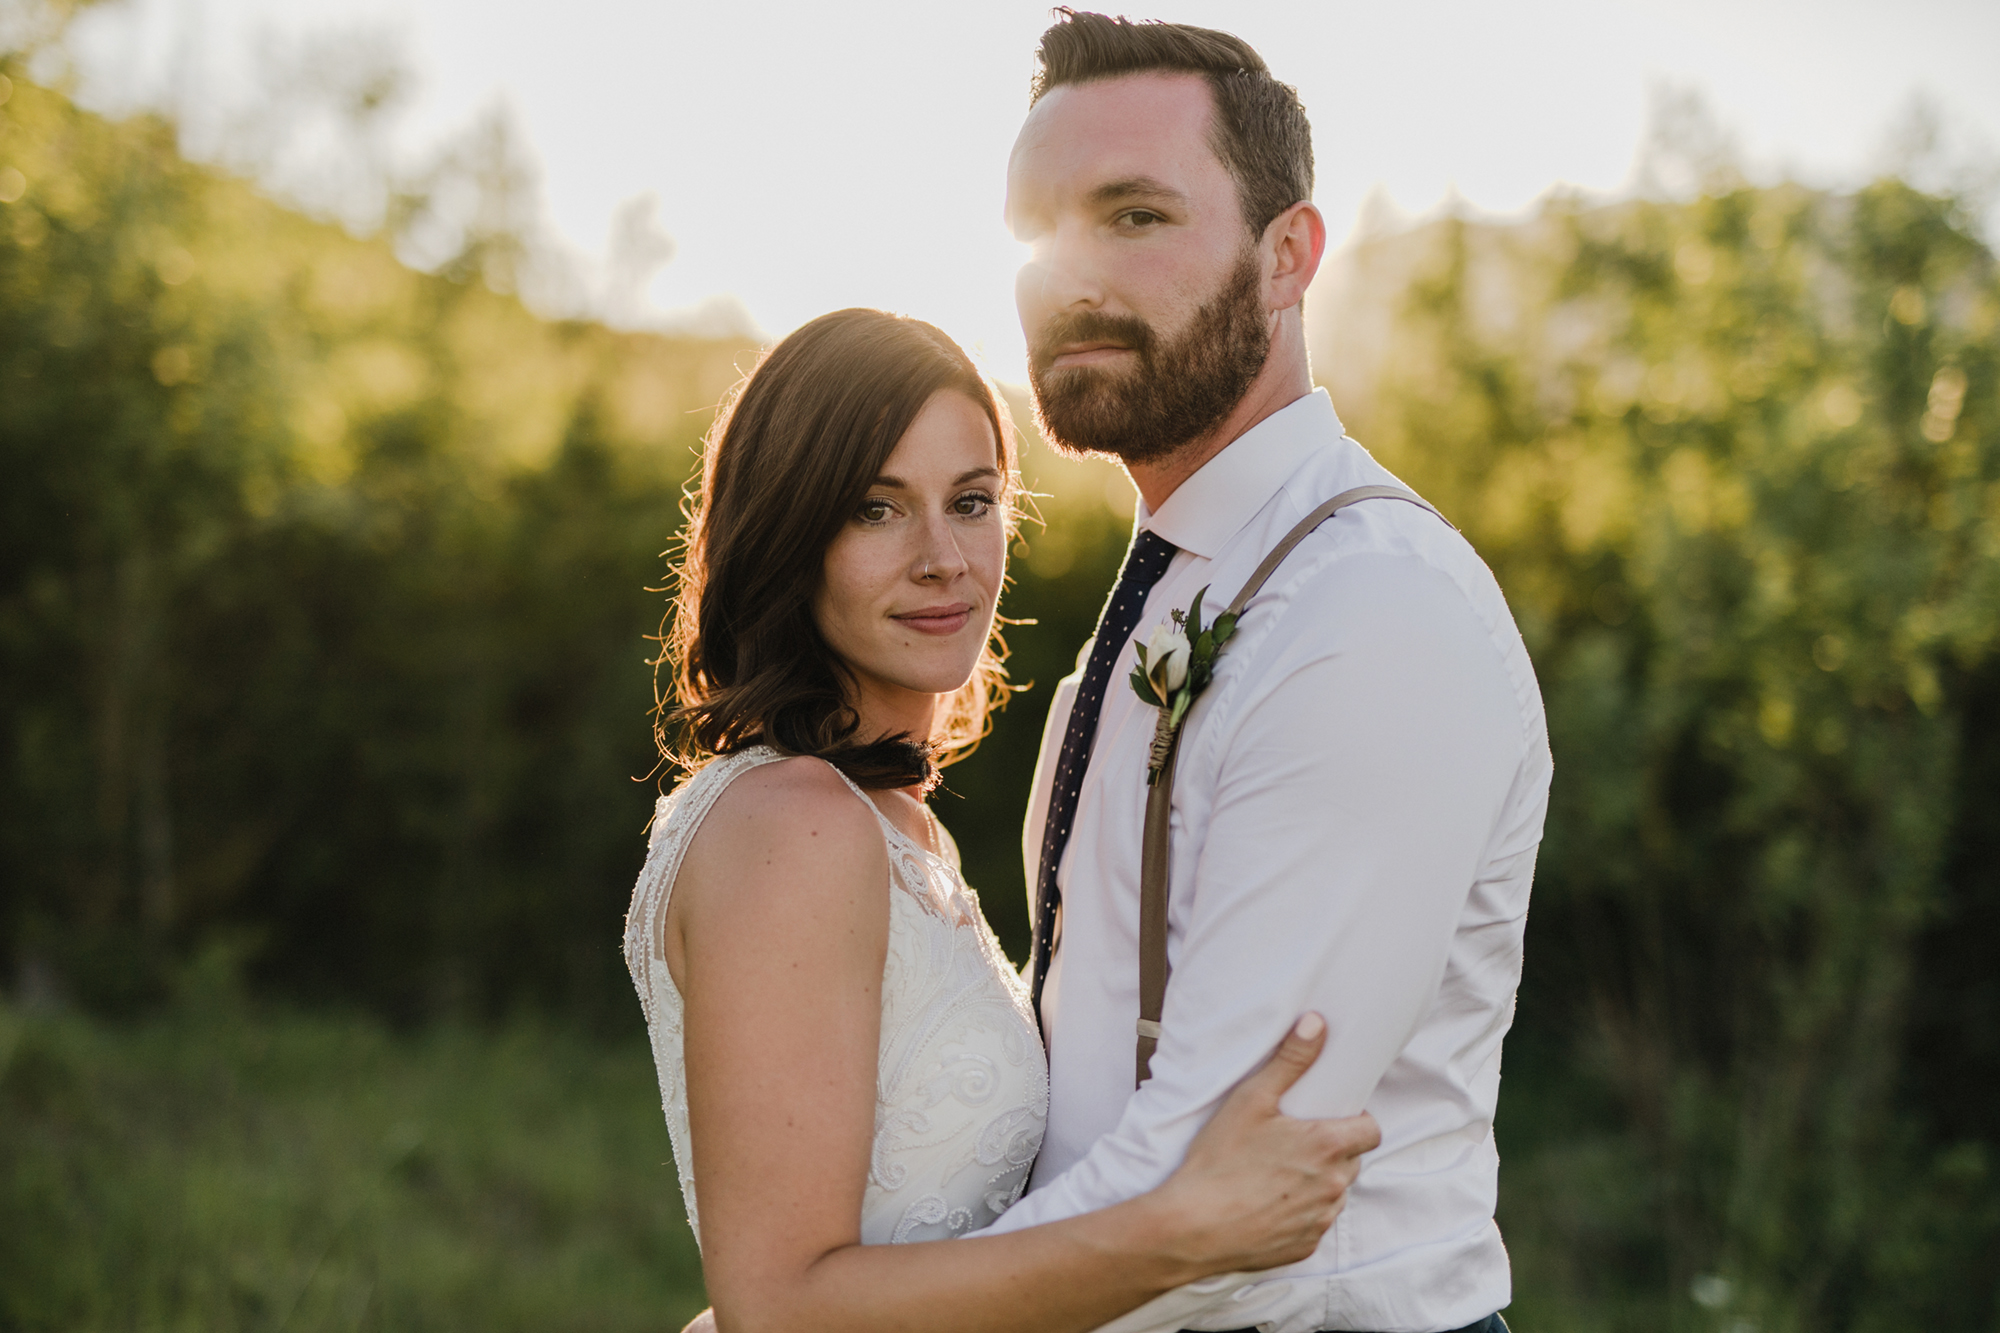 Flower Farm Crowsnest Pass Wedding -078.JPG